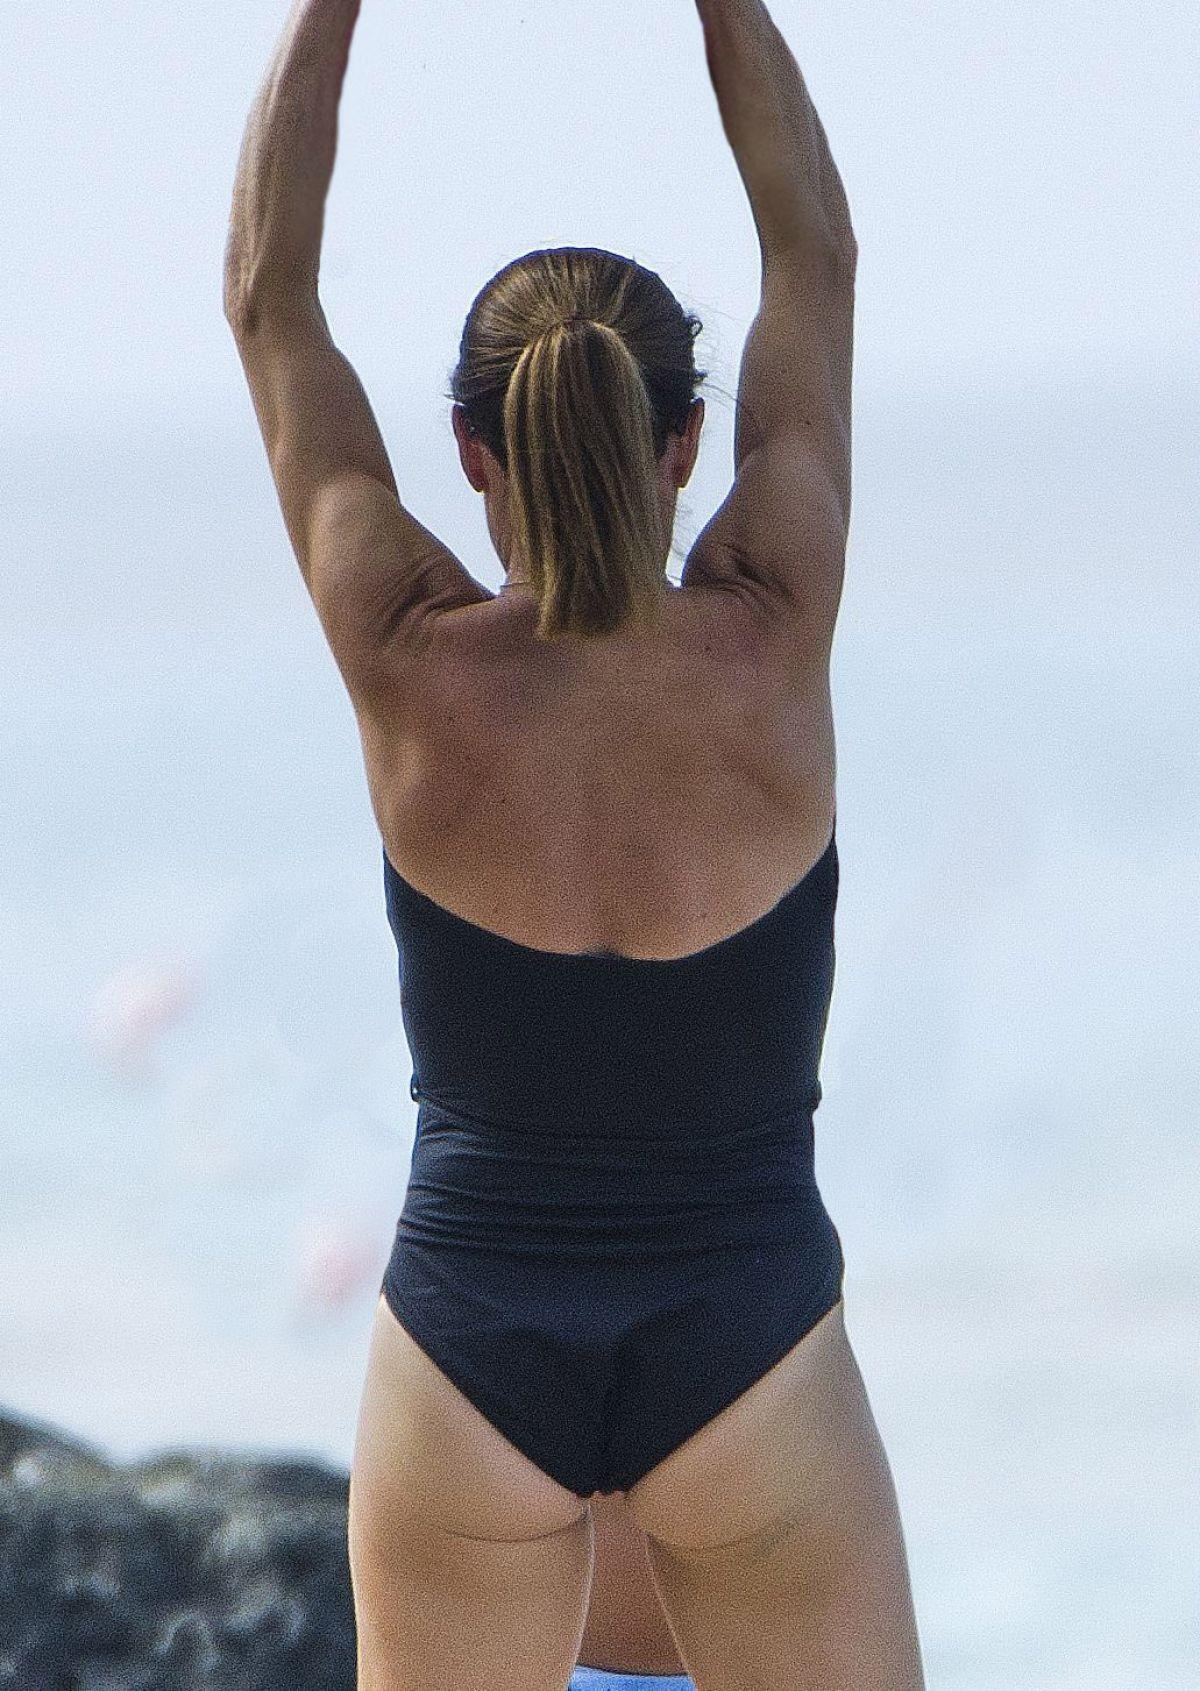 Bikini Natalie Pinkham nudes (38 photo), Ass, Sideboobs, Feet, legs 2020